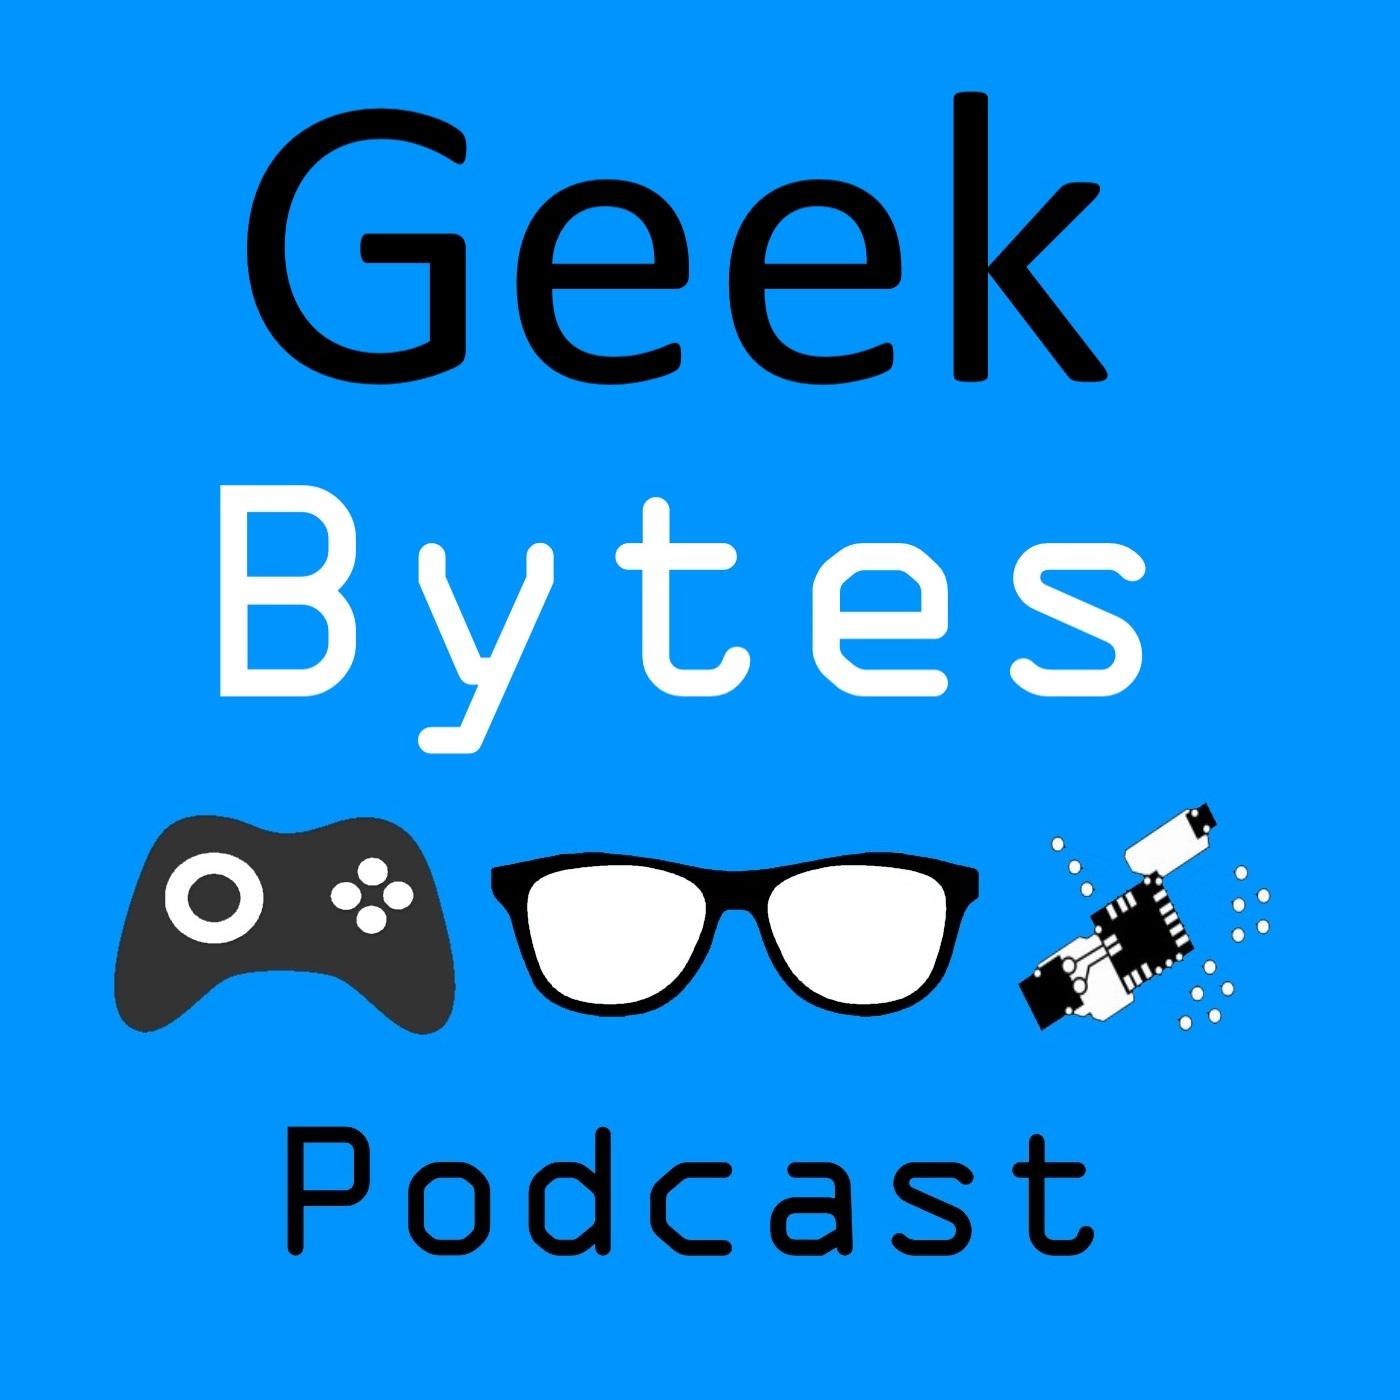 Geek Bytes Podcast Shownotes — LitRPG Podcast